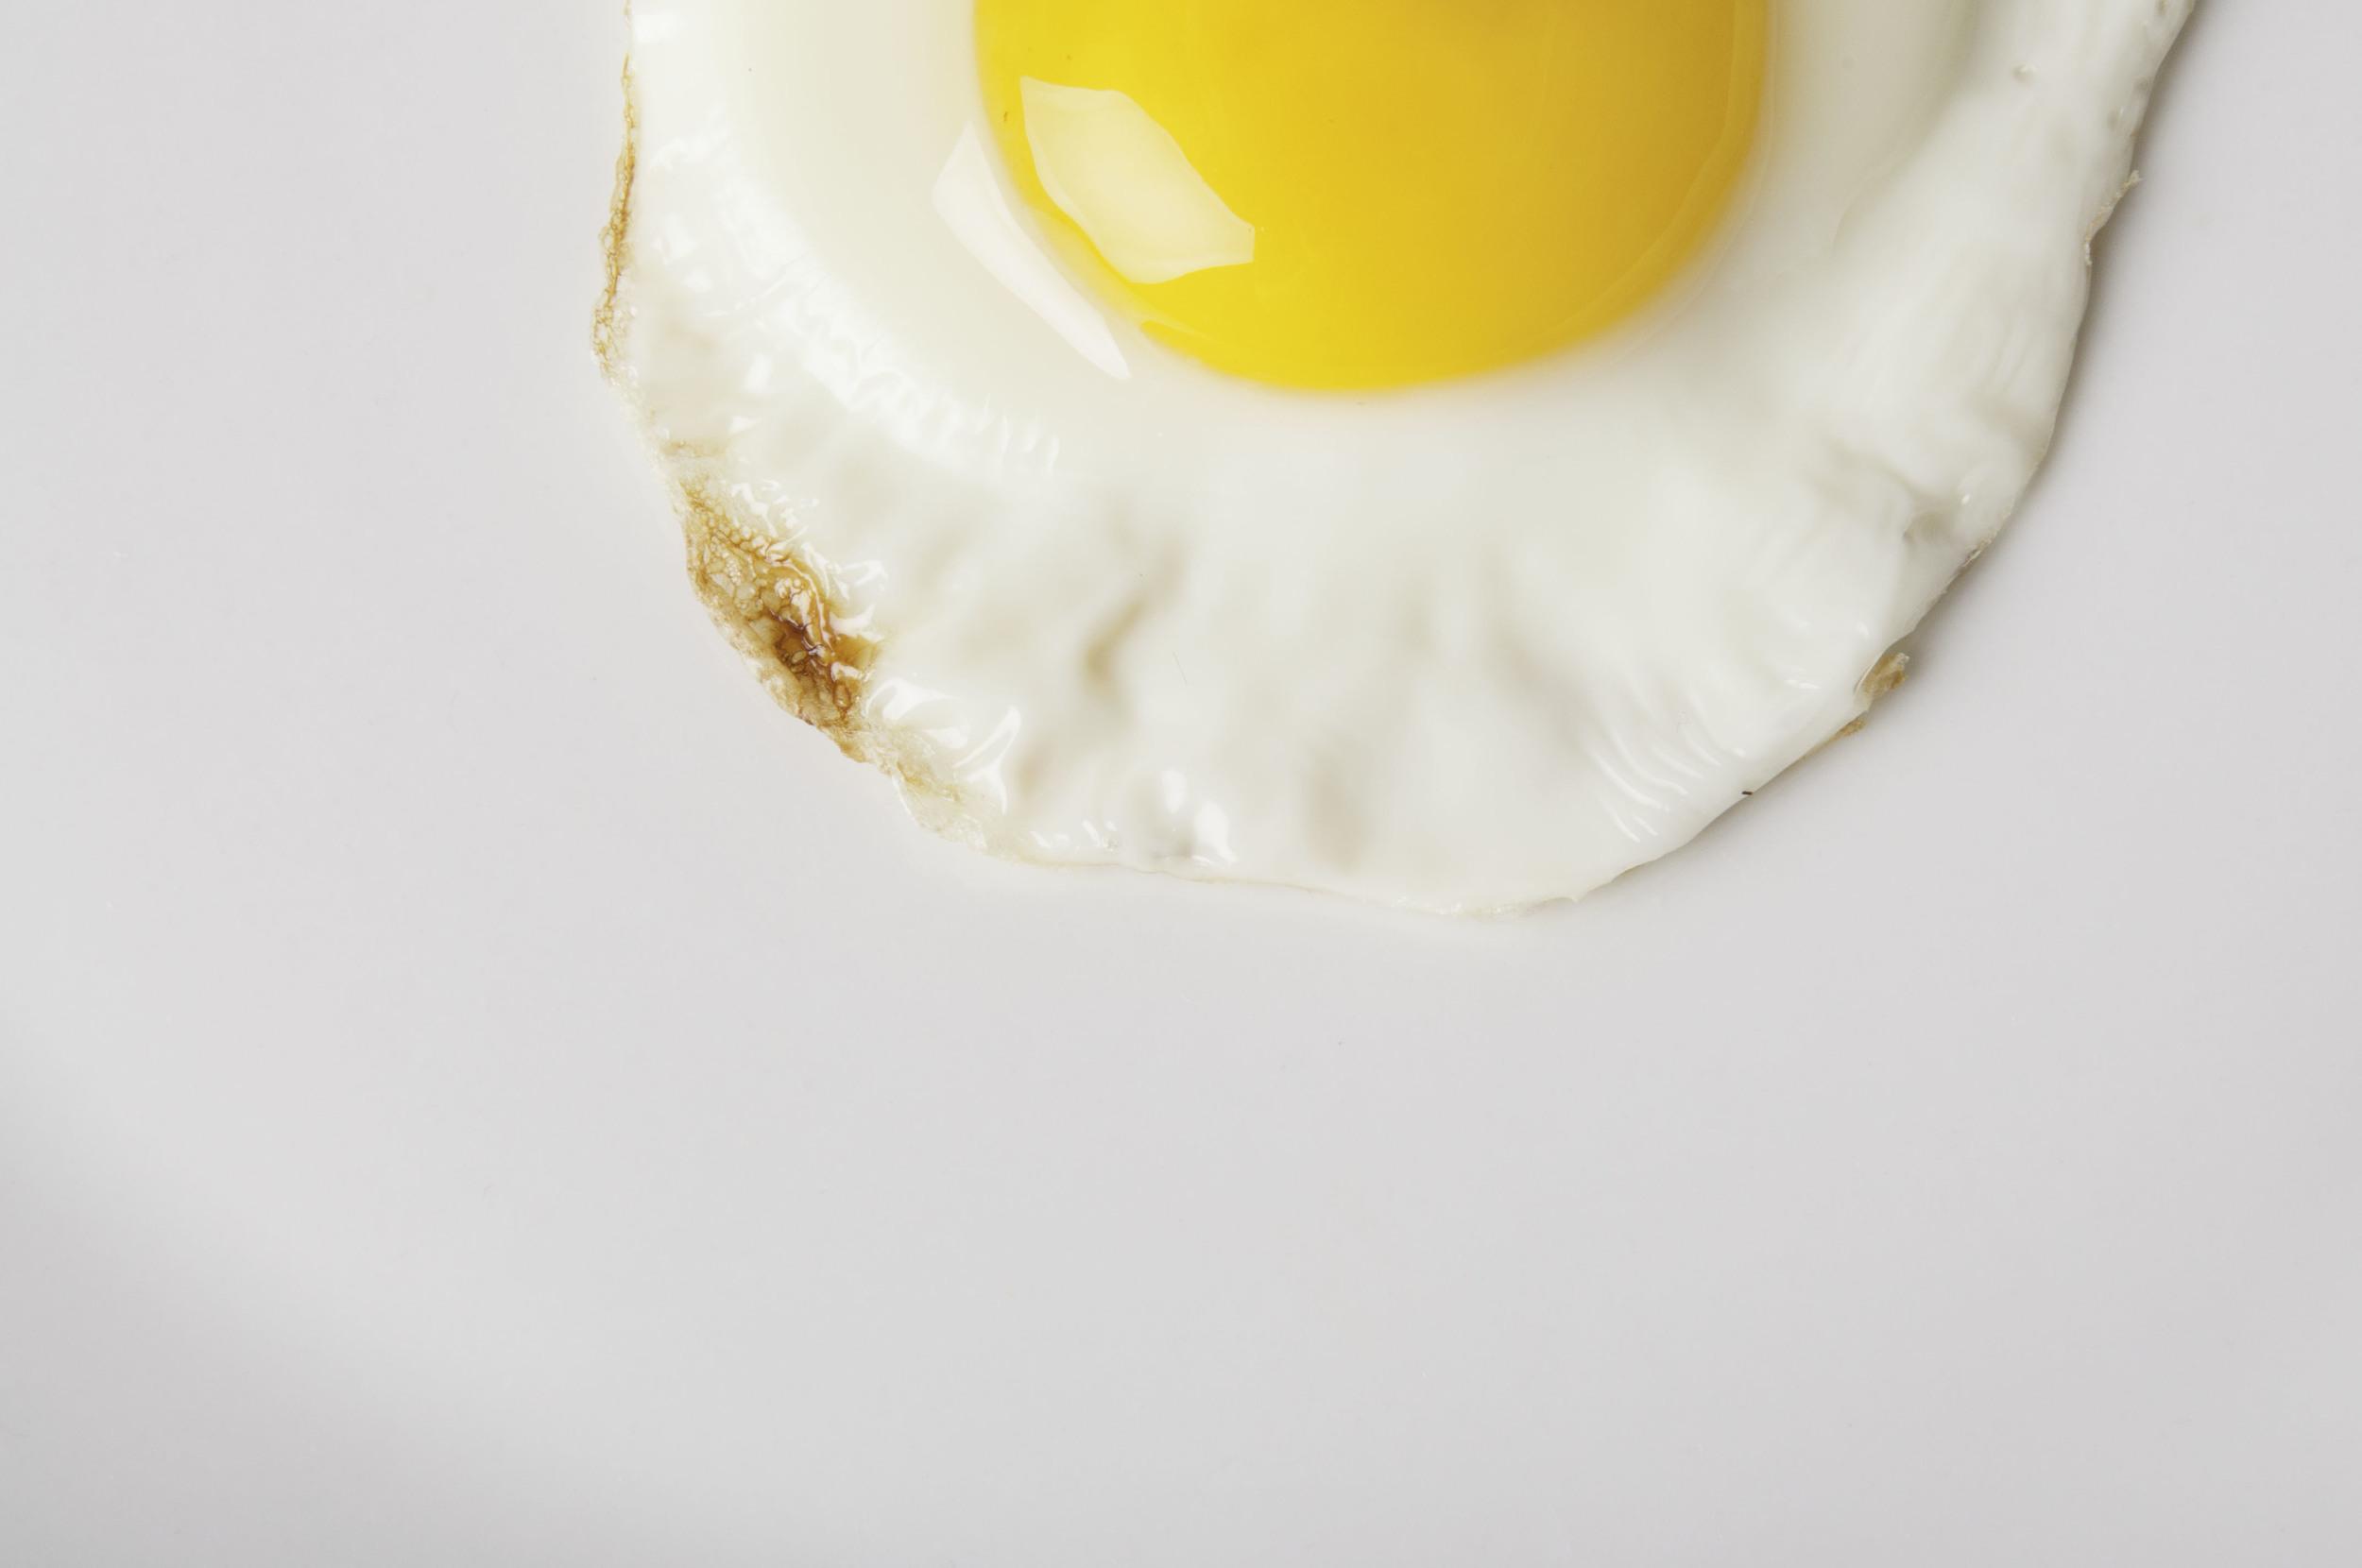 photoapps_foodbook001_17.jpg